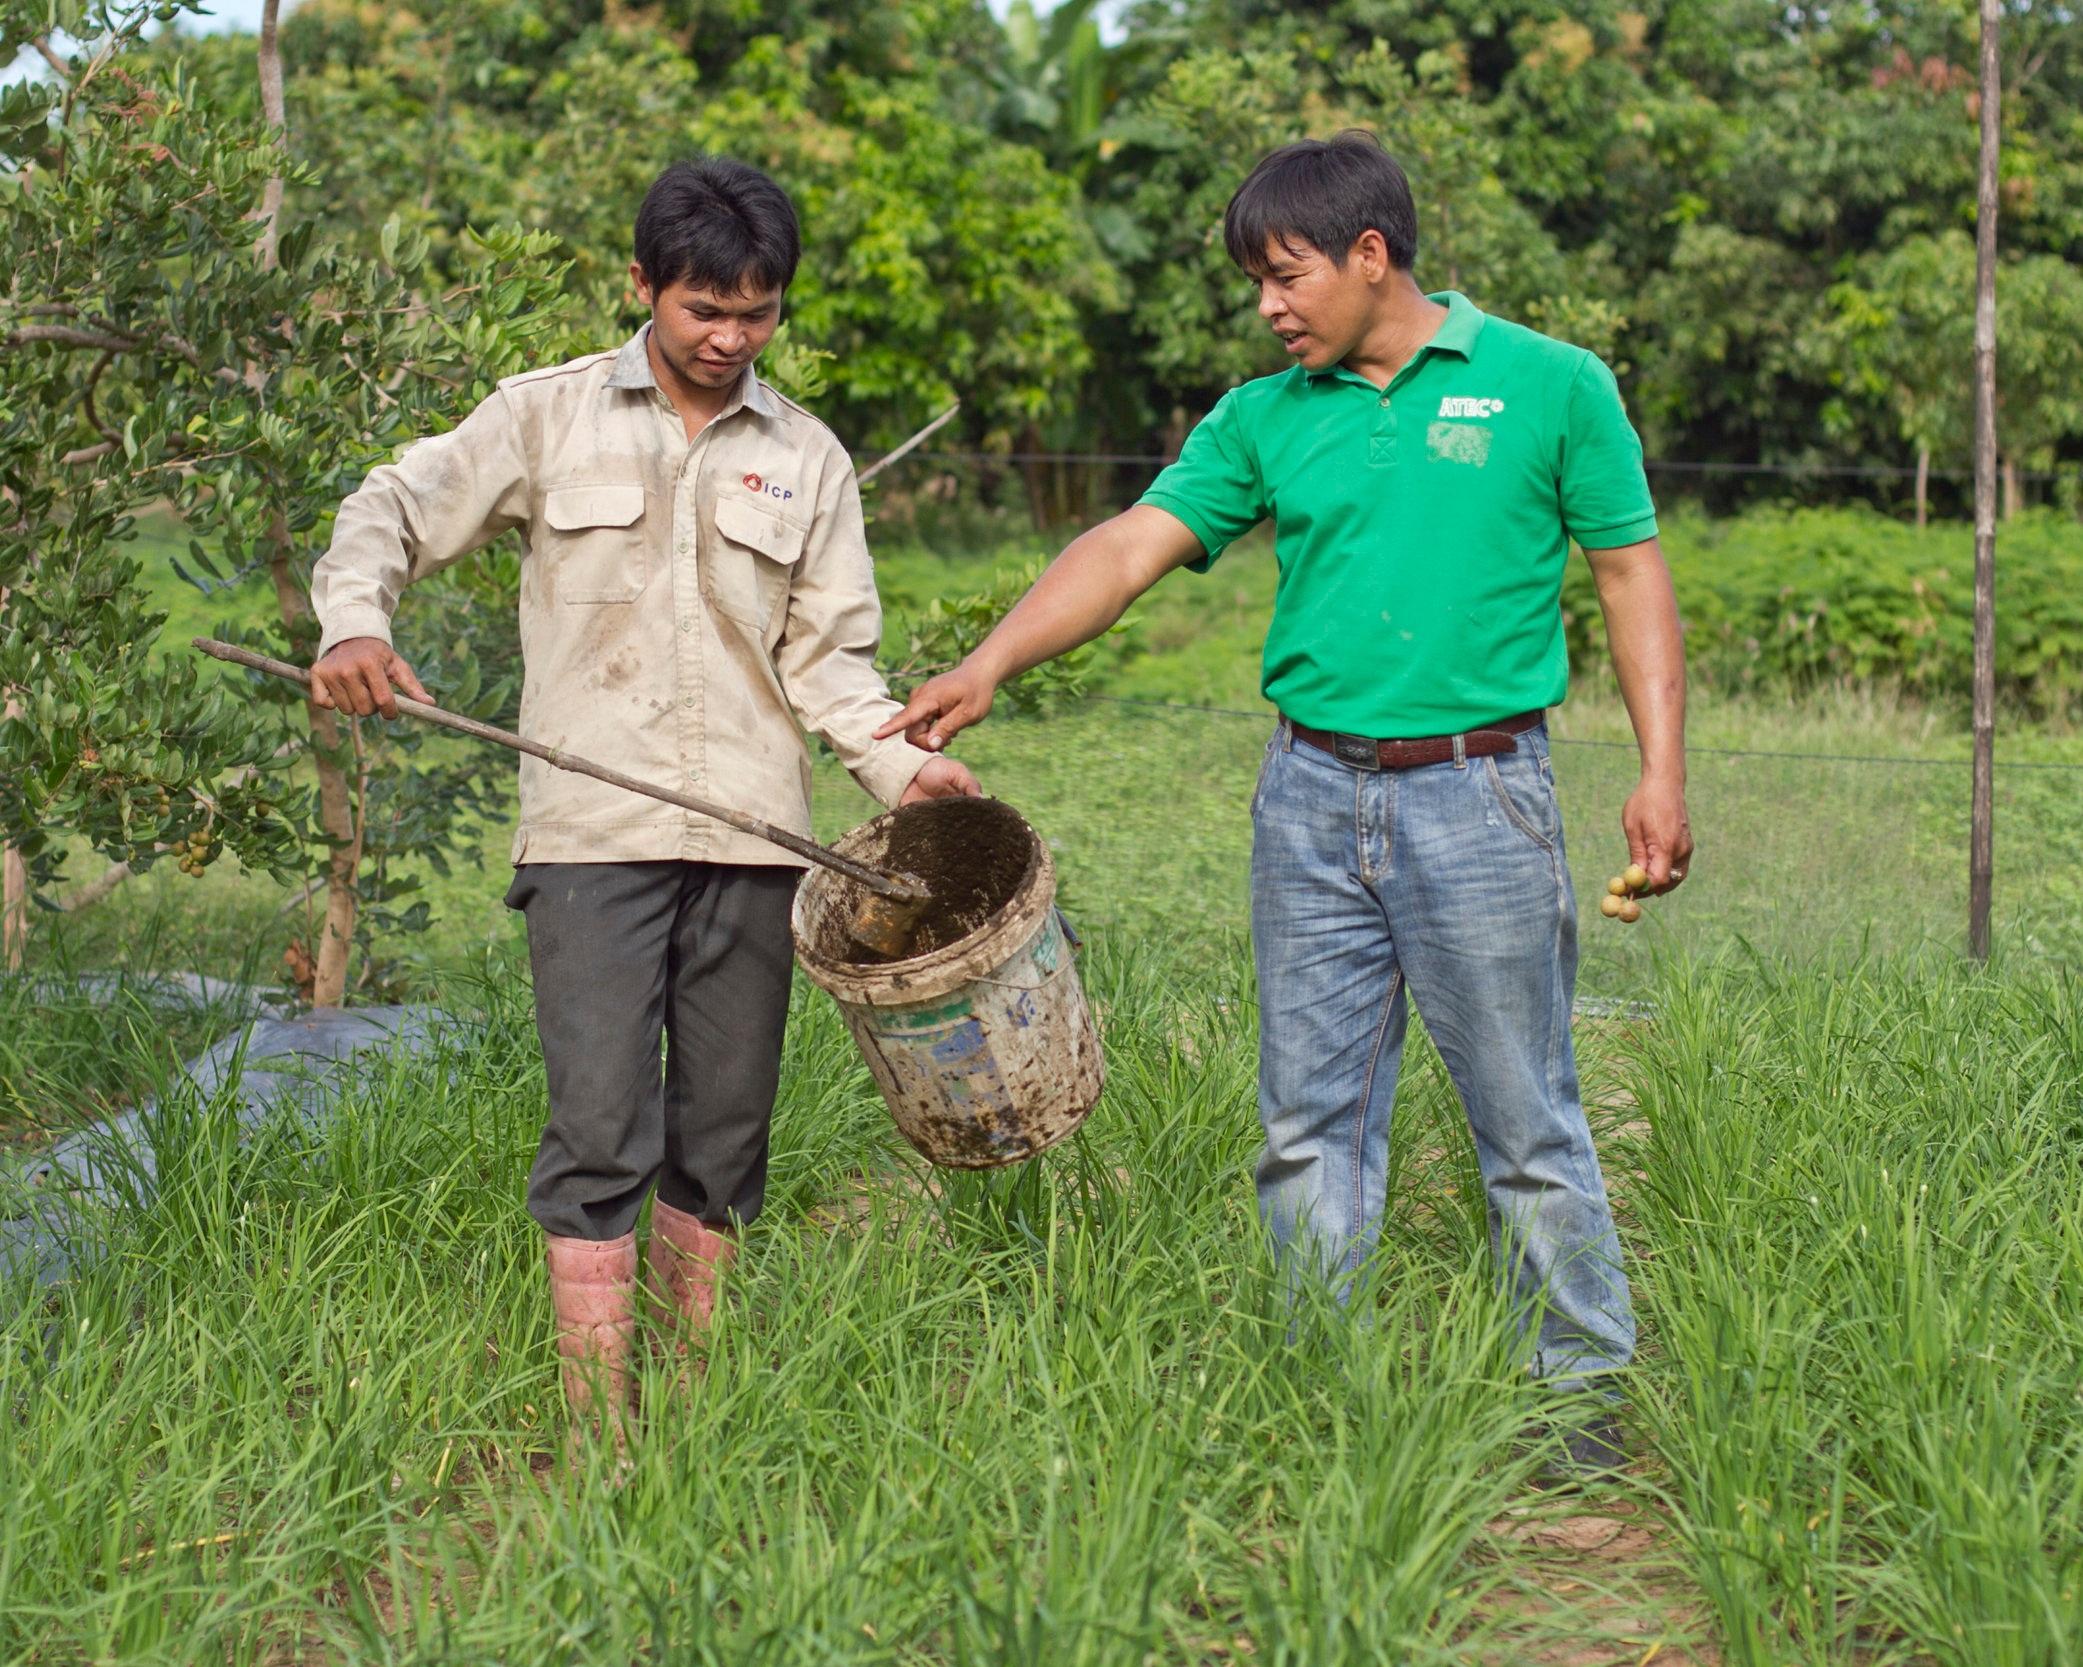 Cambodia_ATEC_Farmers+Applying+Fertilizer.jpg